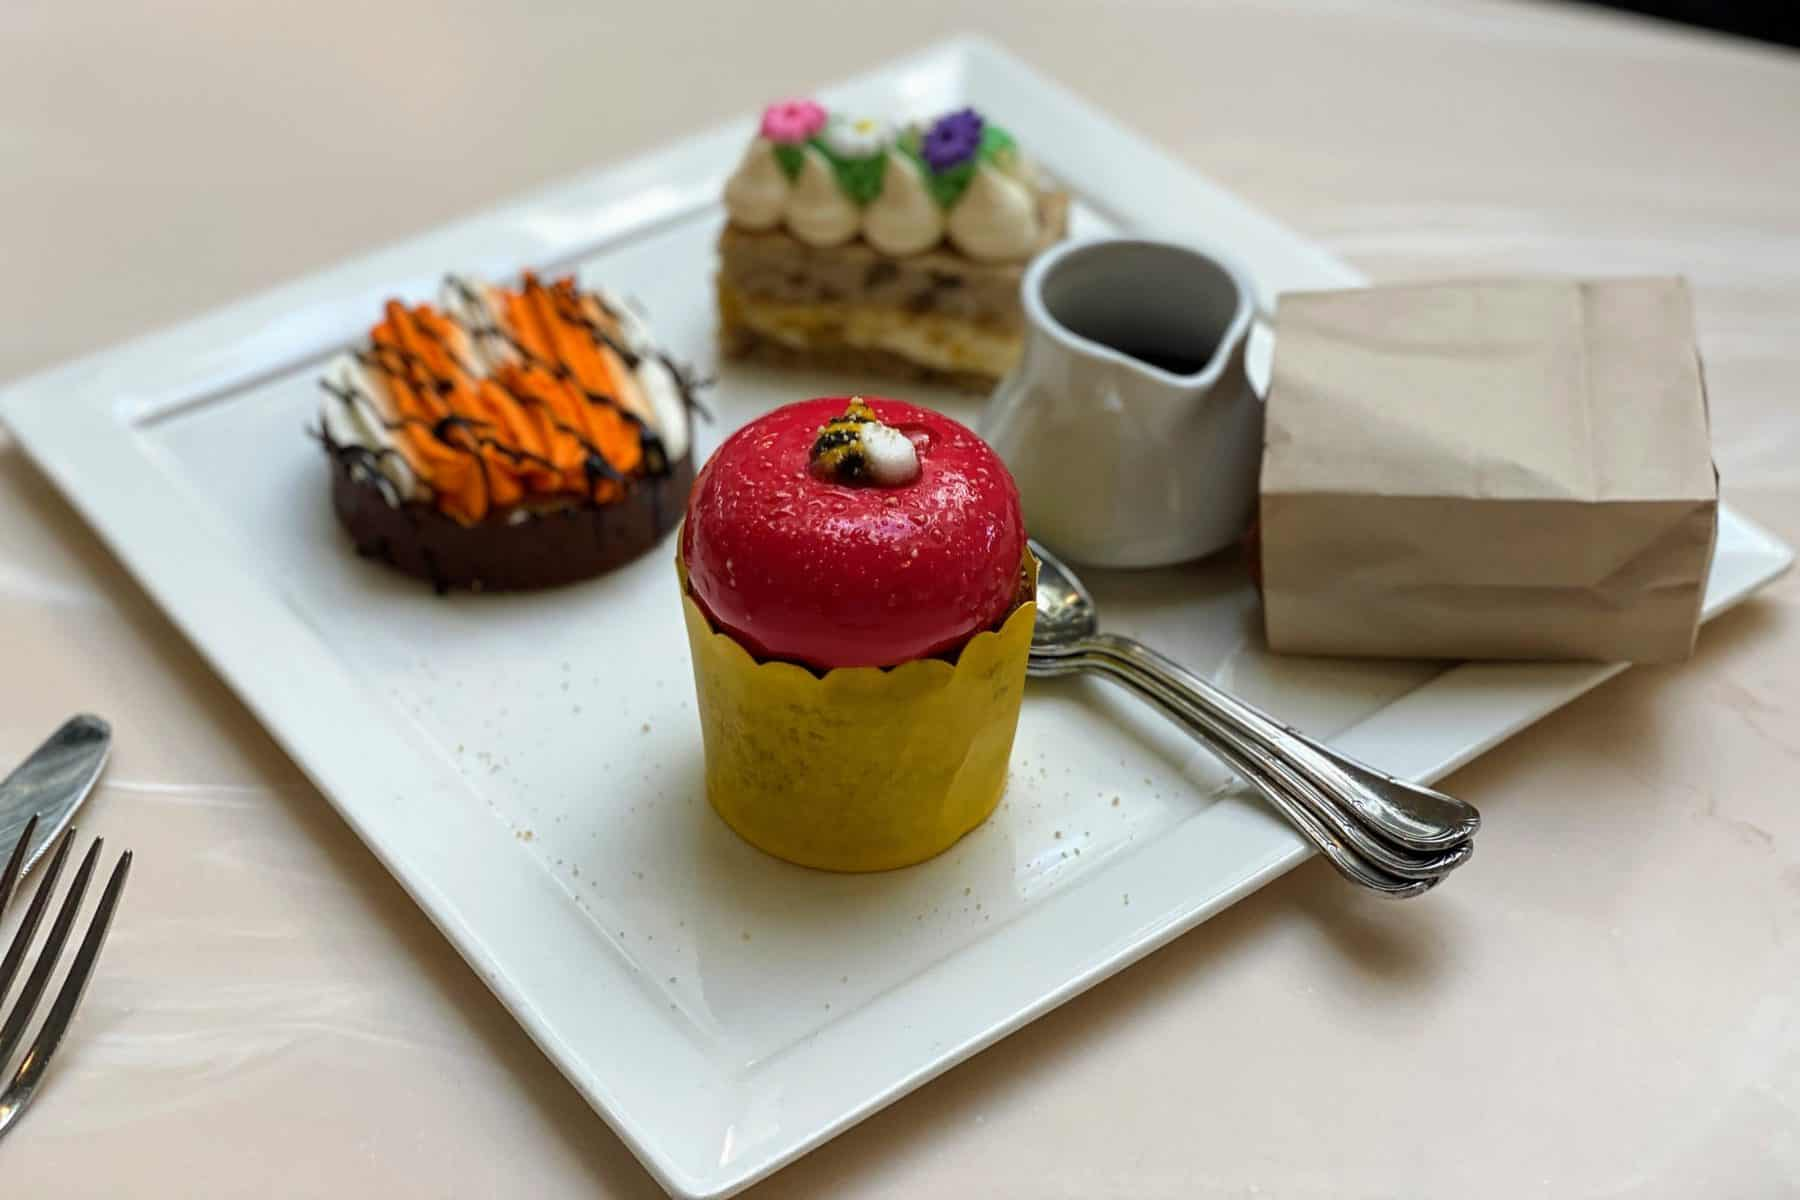 Desserts at Crystal Palace